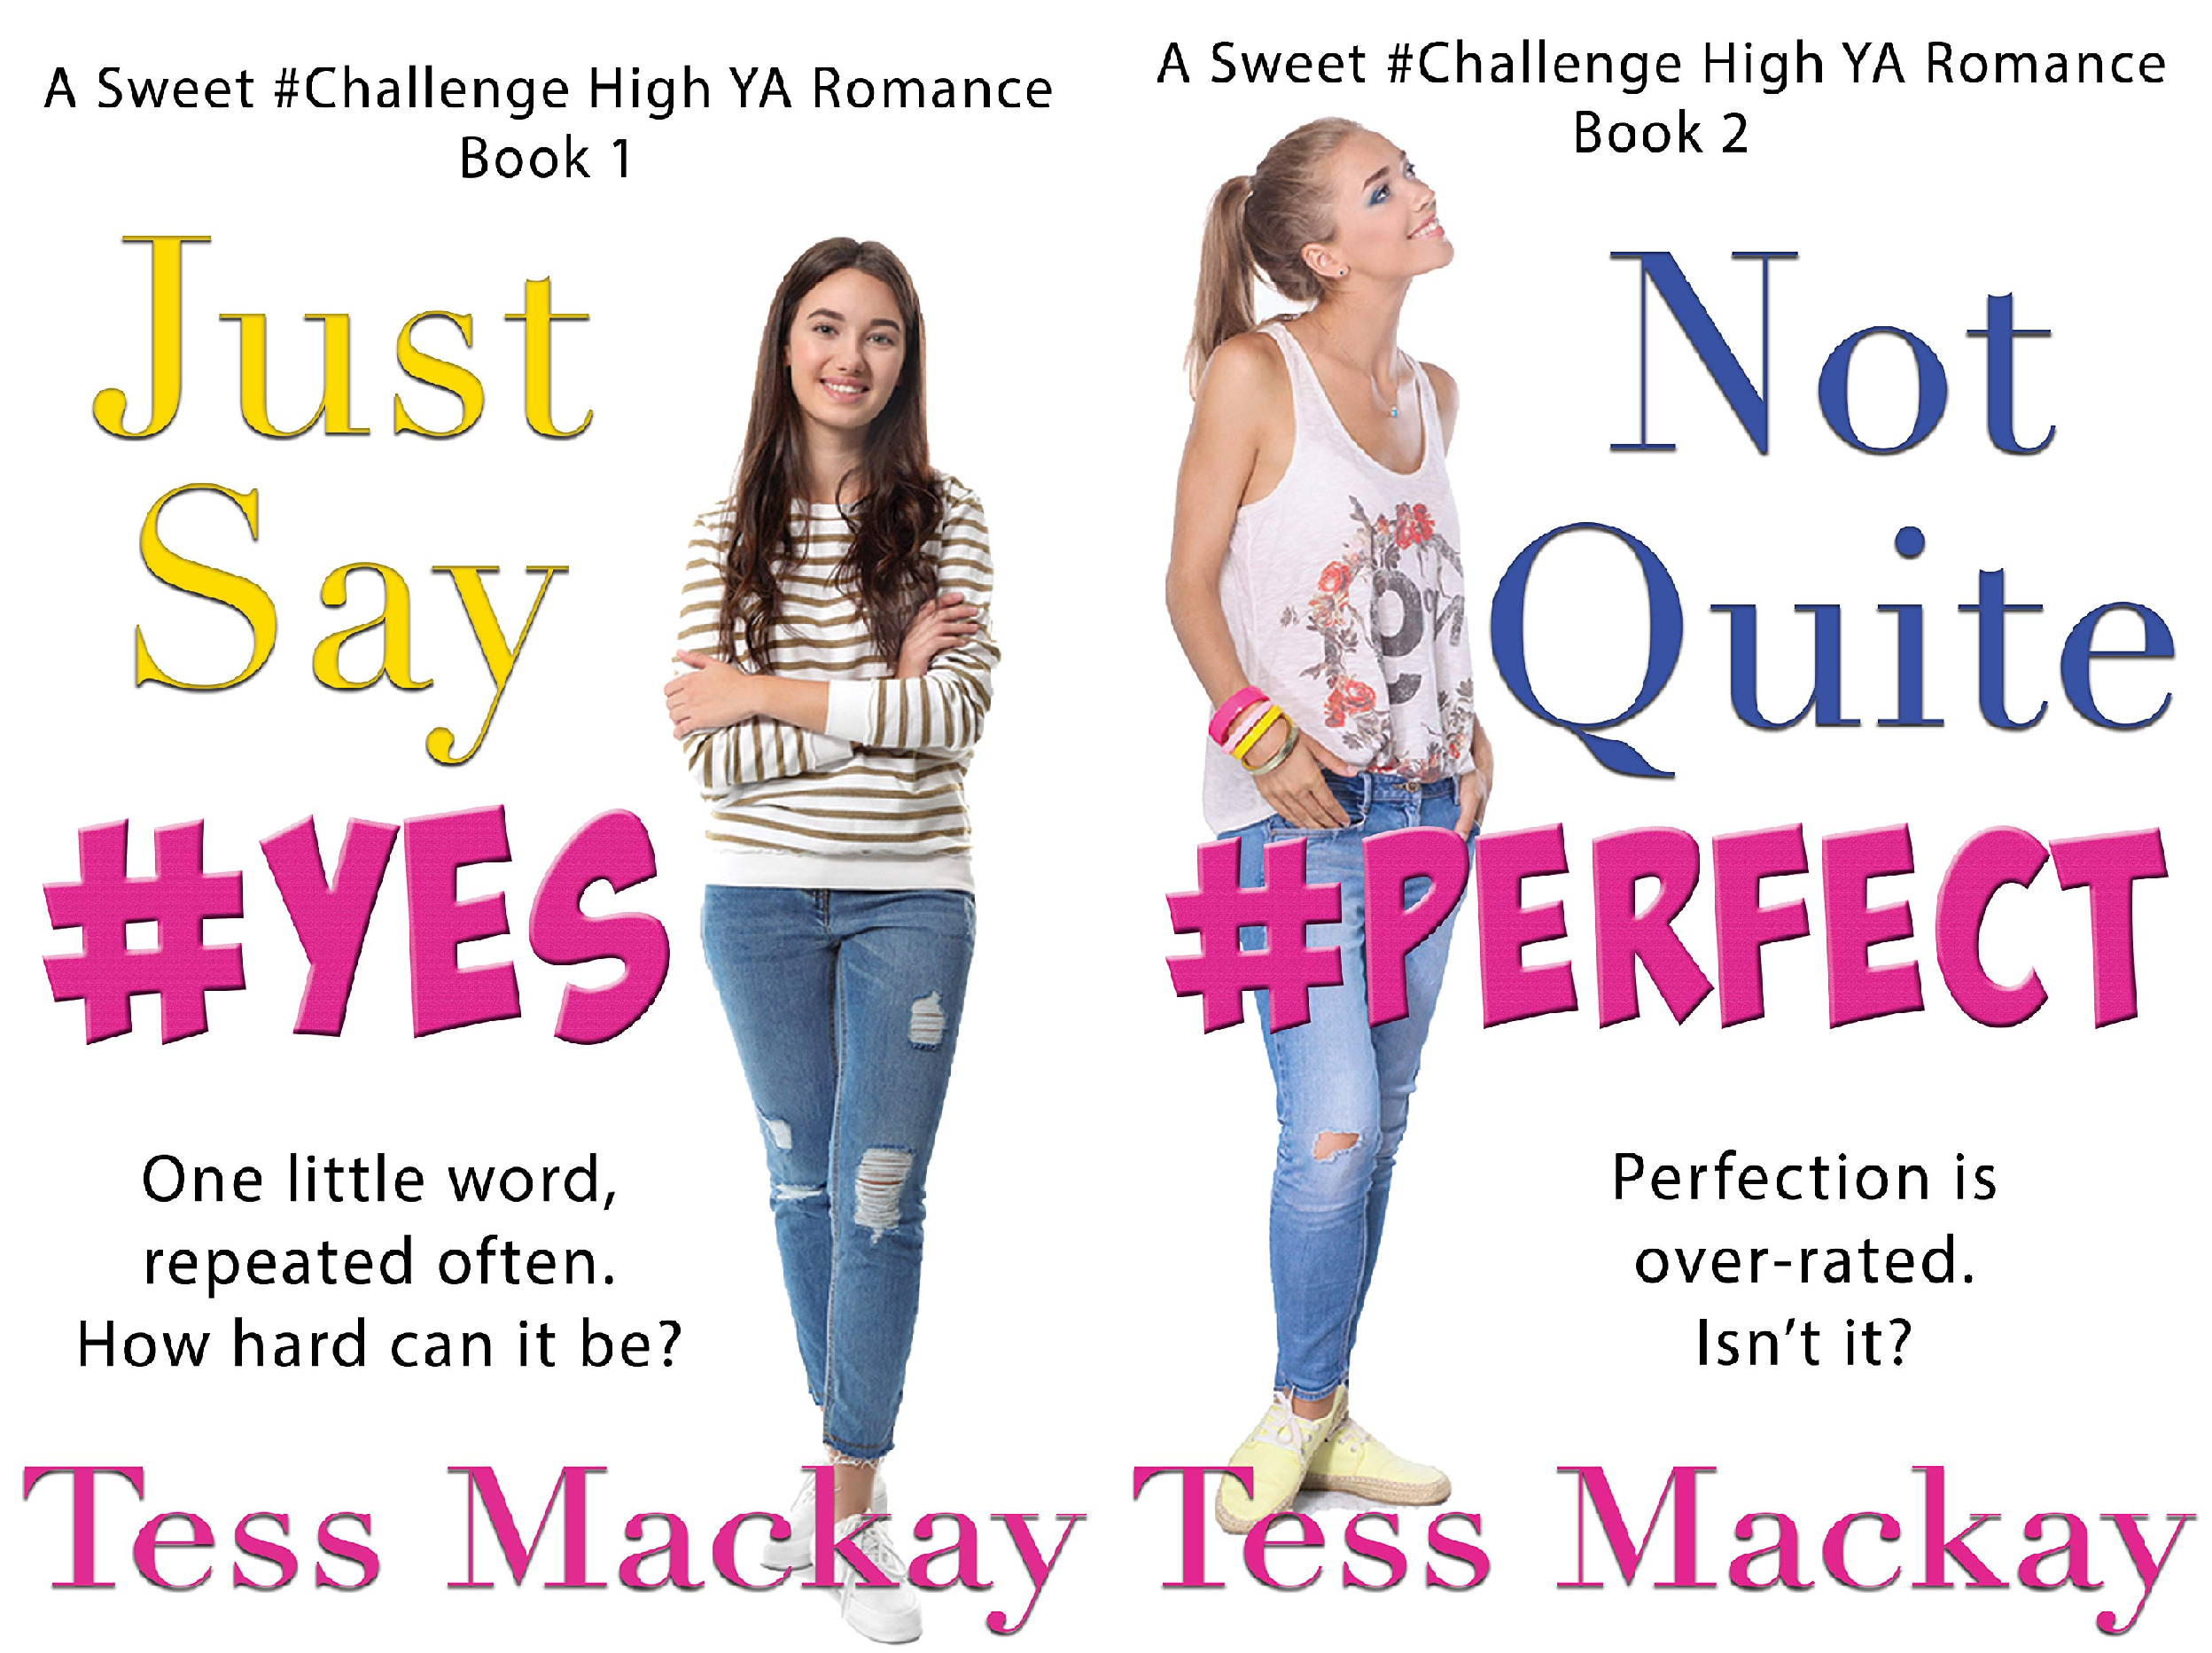 A Sweet #Challenge High YA Romance (2 Book Series)